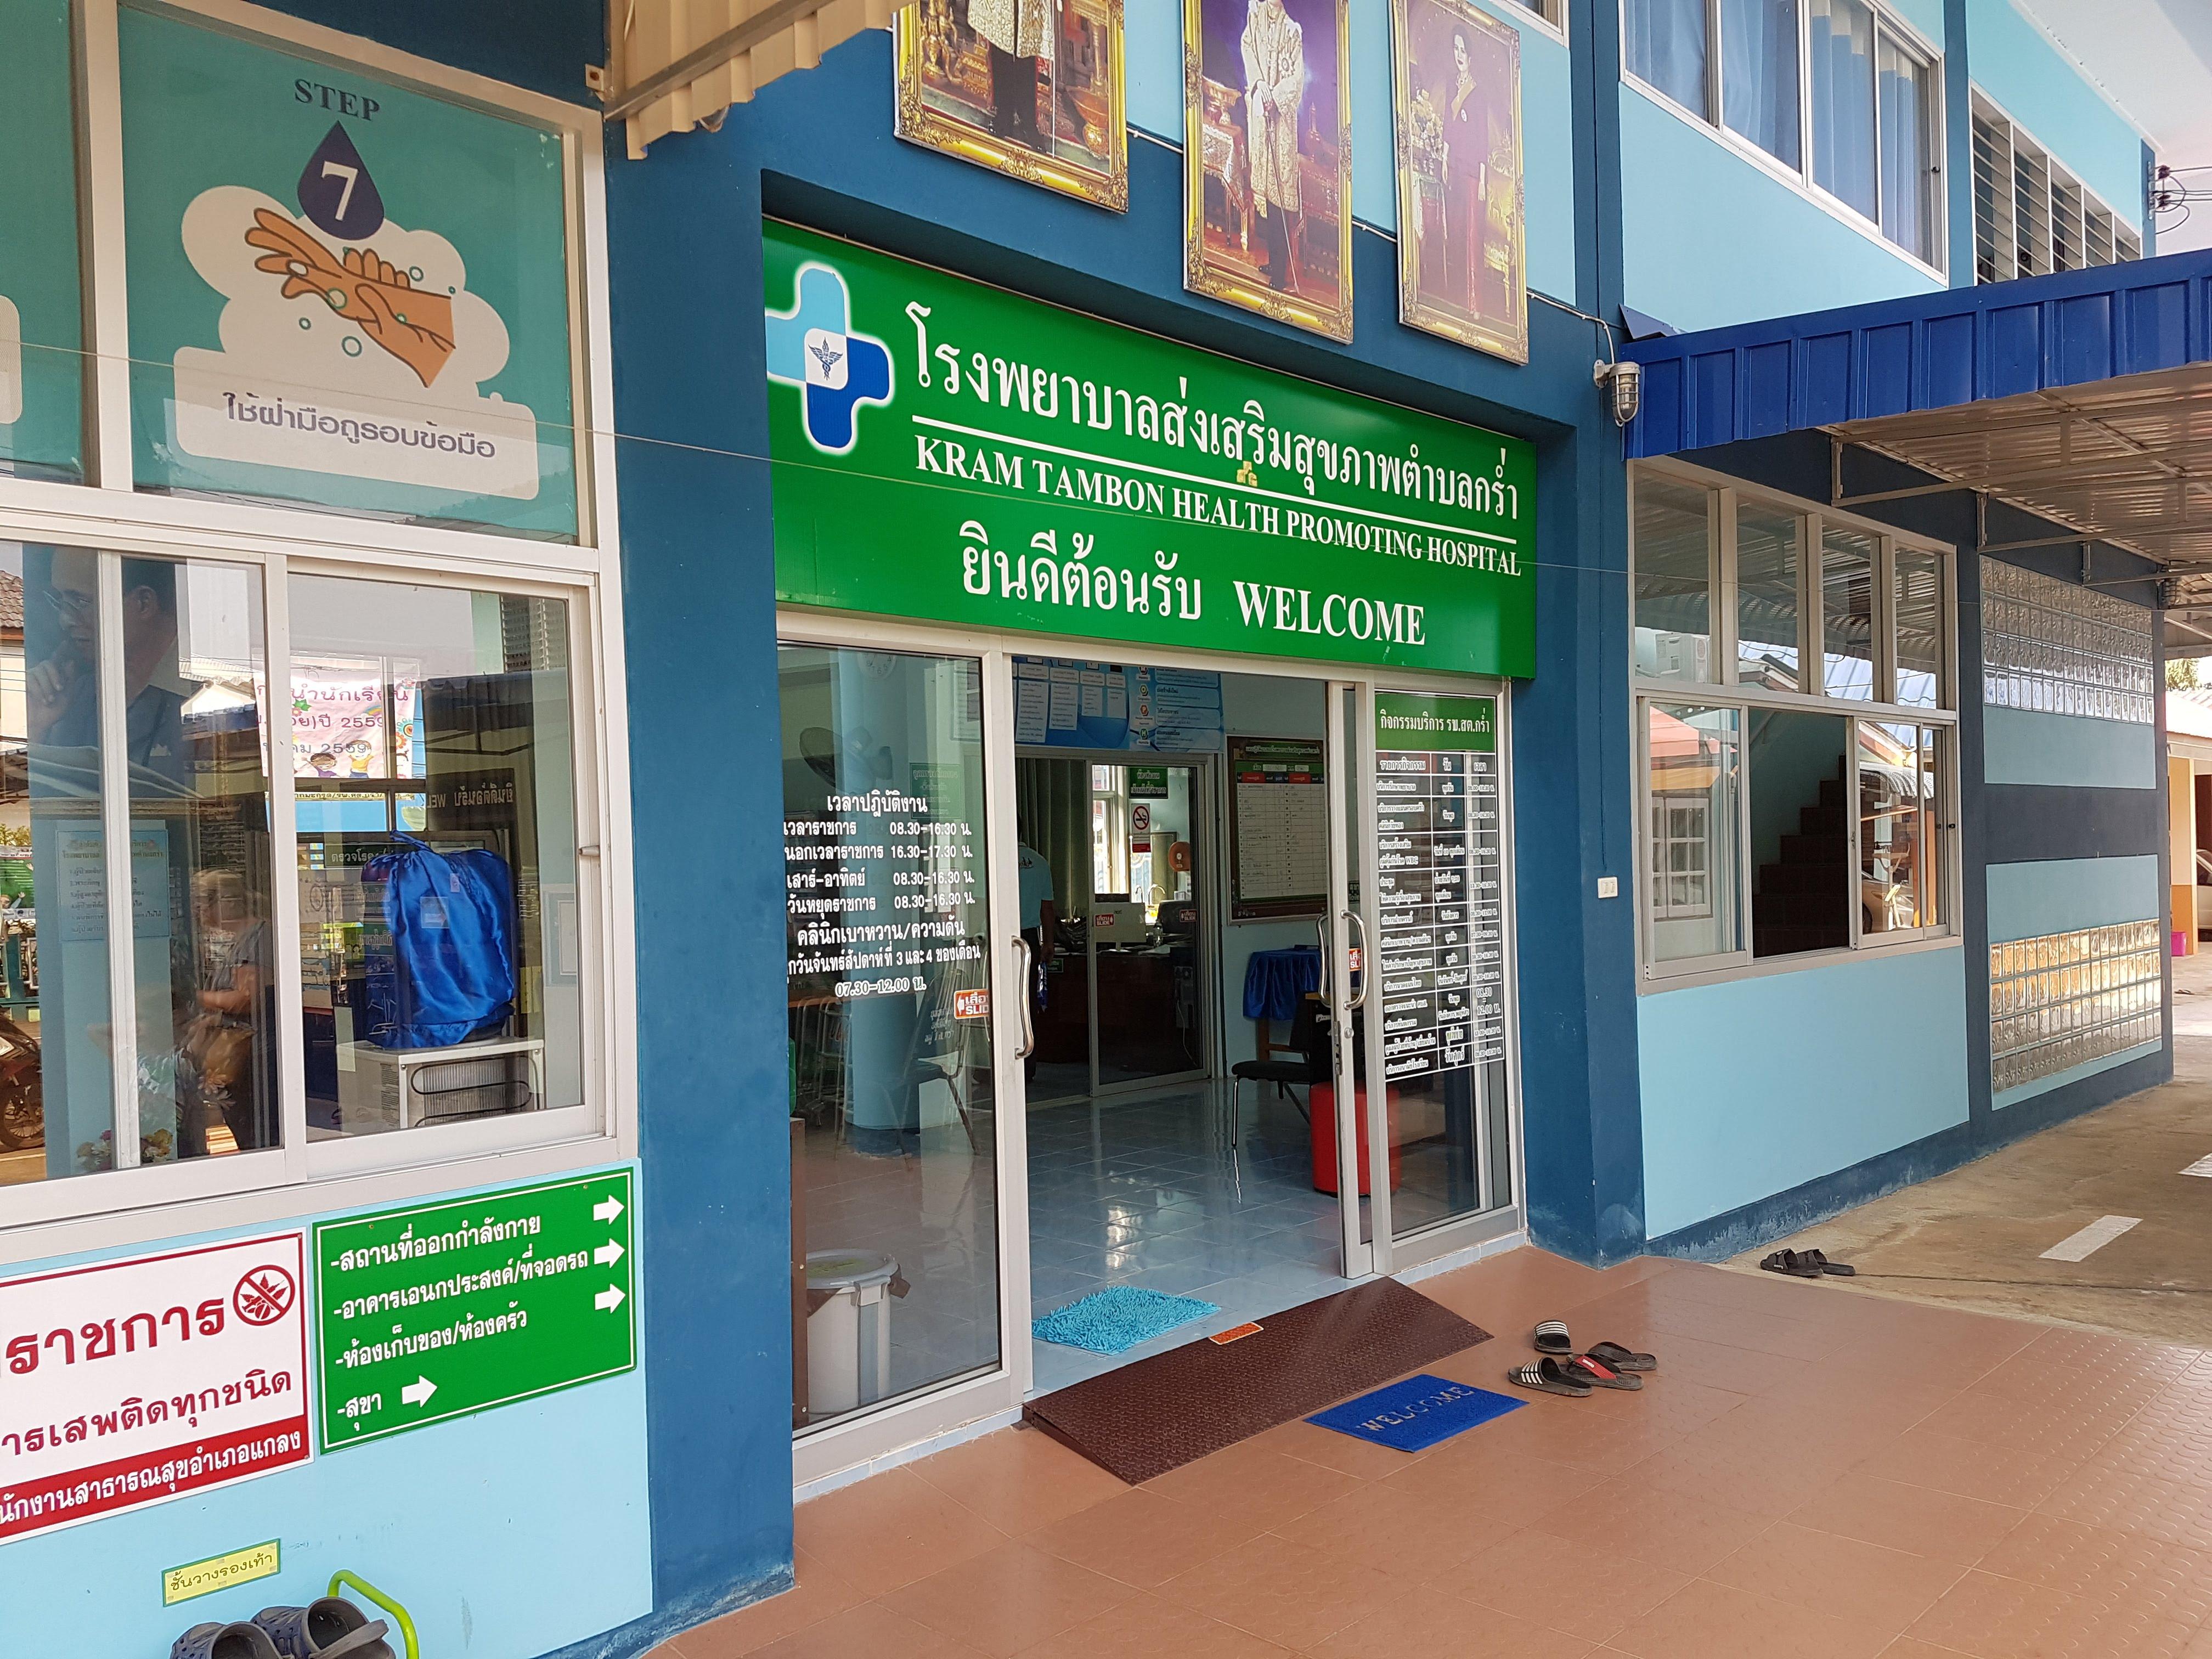 Allmänna kliniken